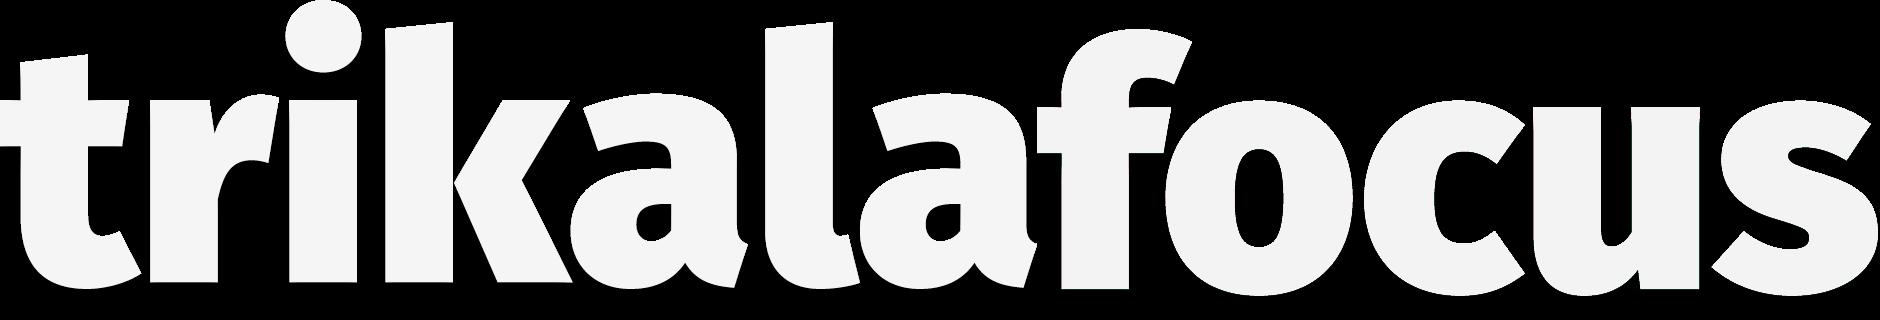 https://www.trikalafocus.gr/wp-content/uploads/2019/11/logo-w.png